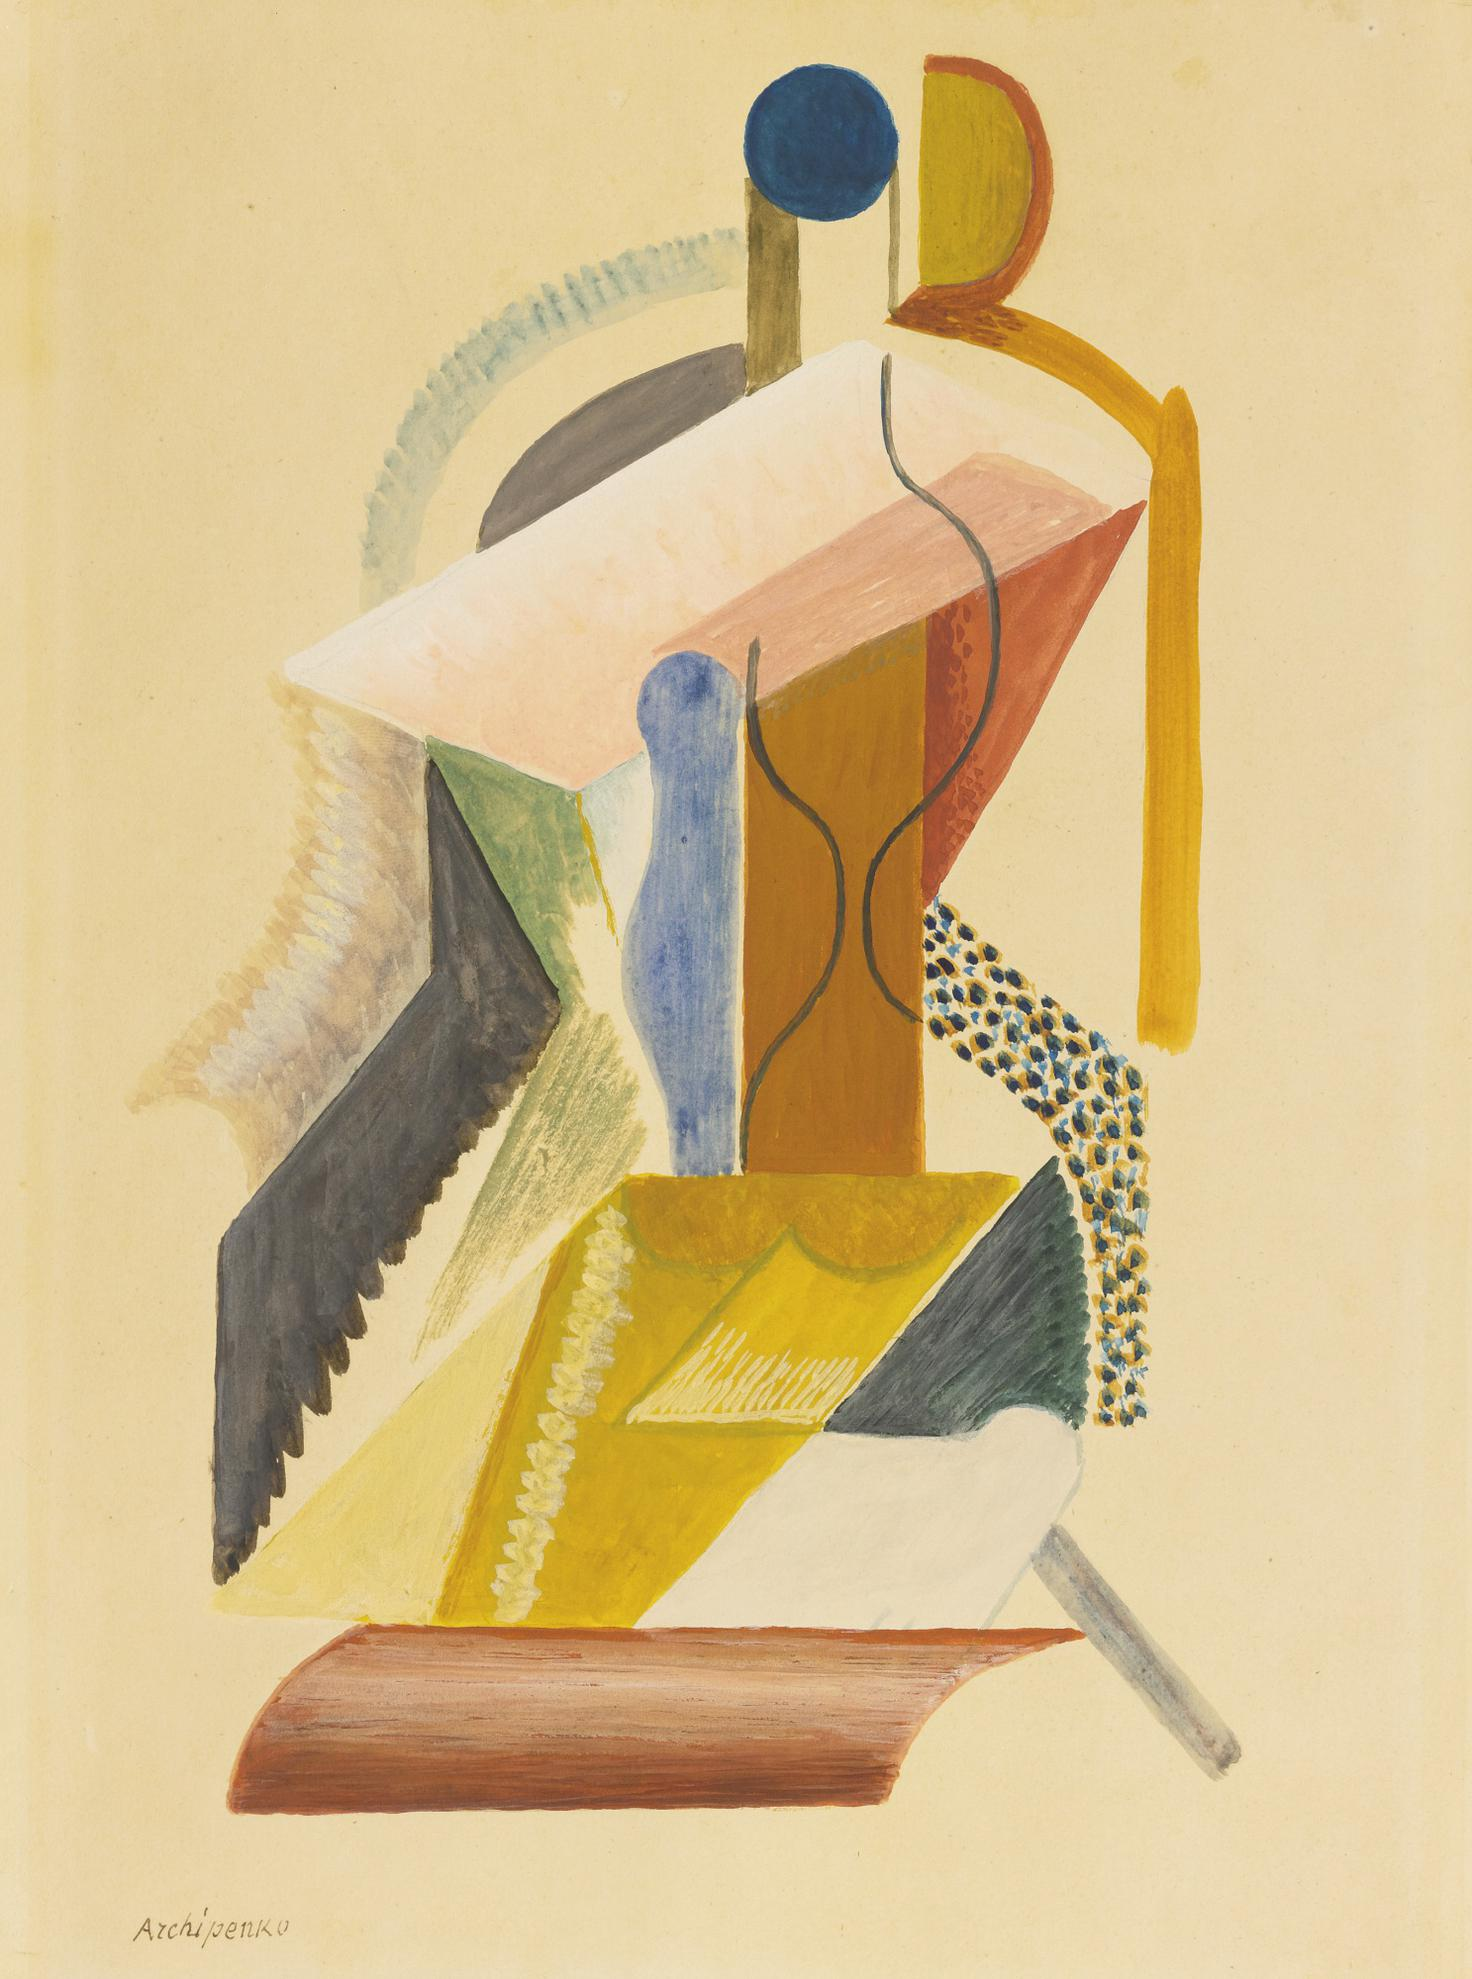 Alexander Archipenko-Composition Cubiste-